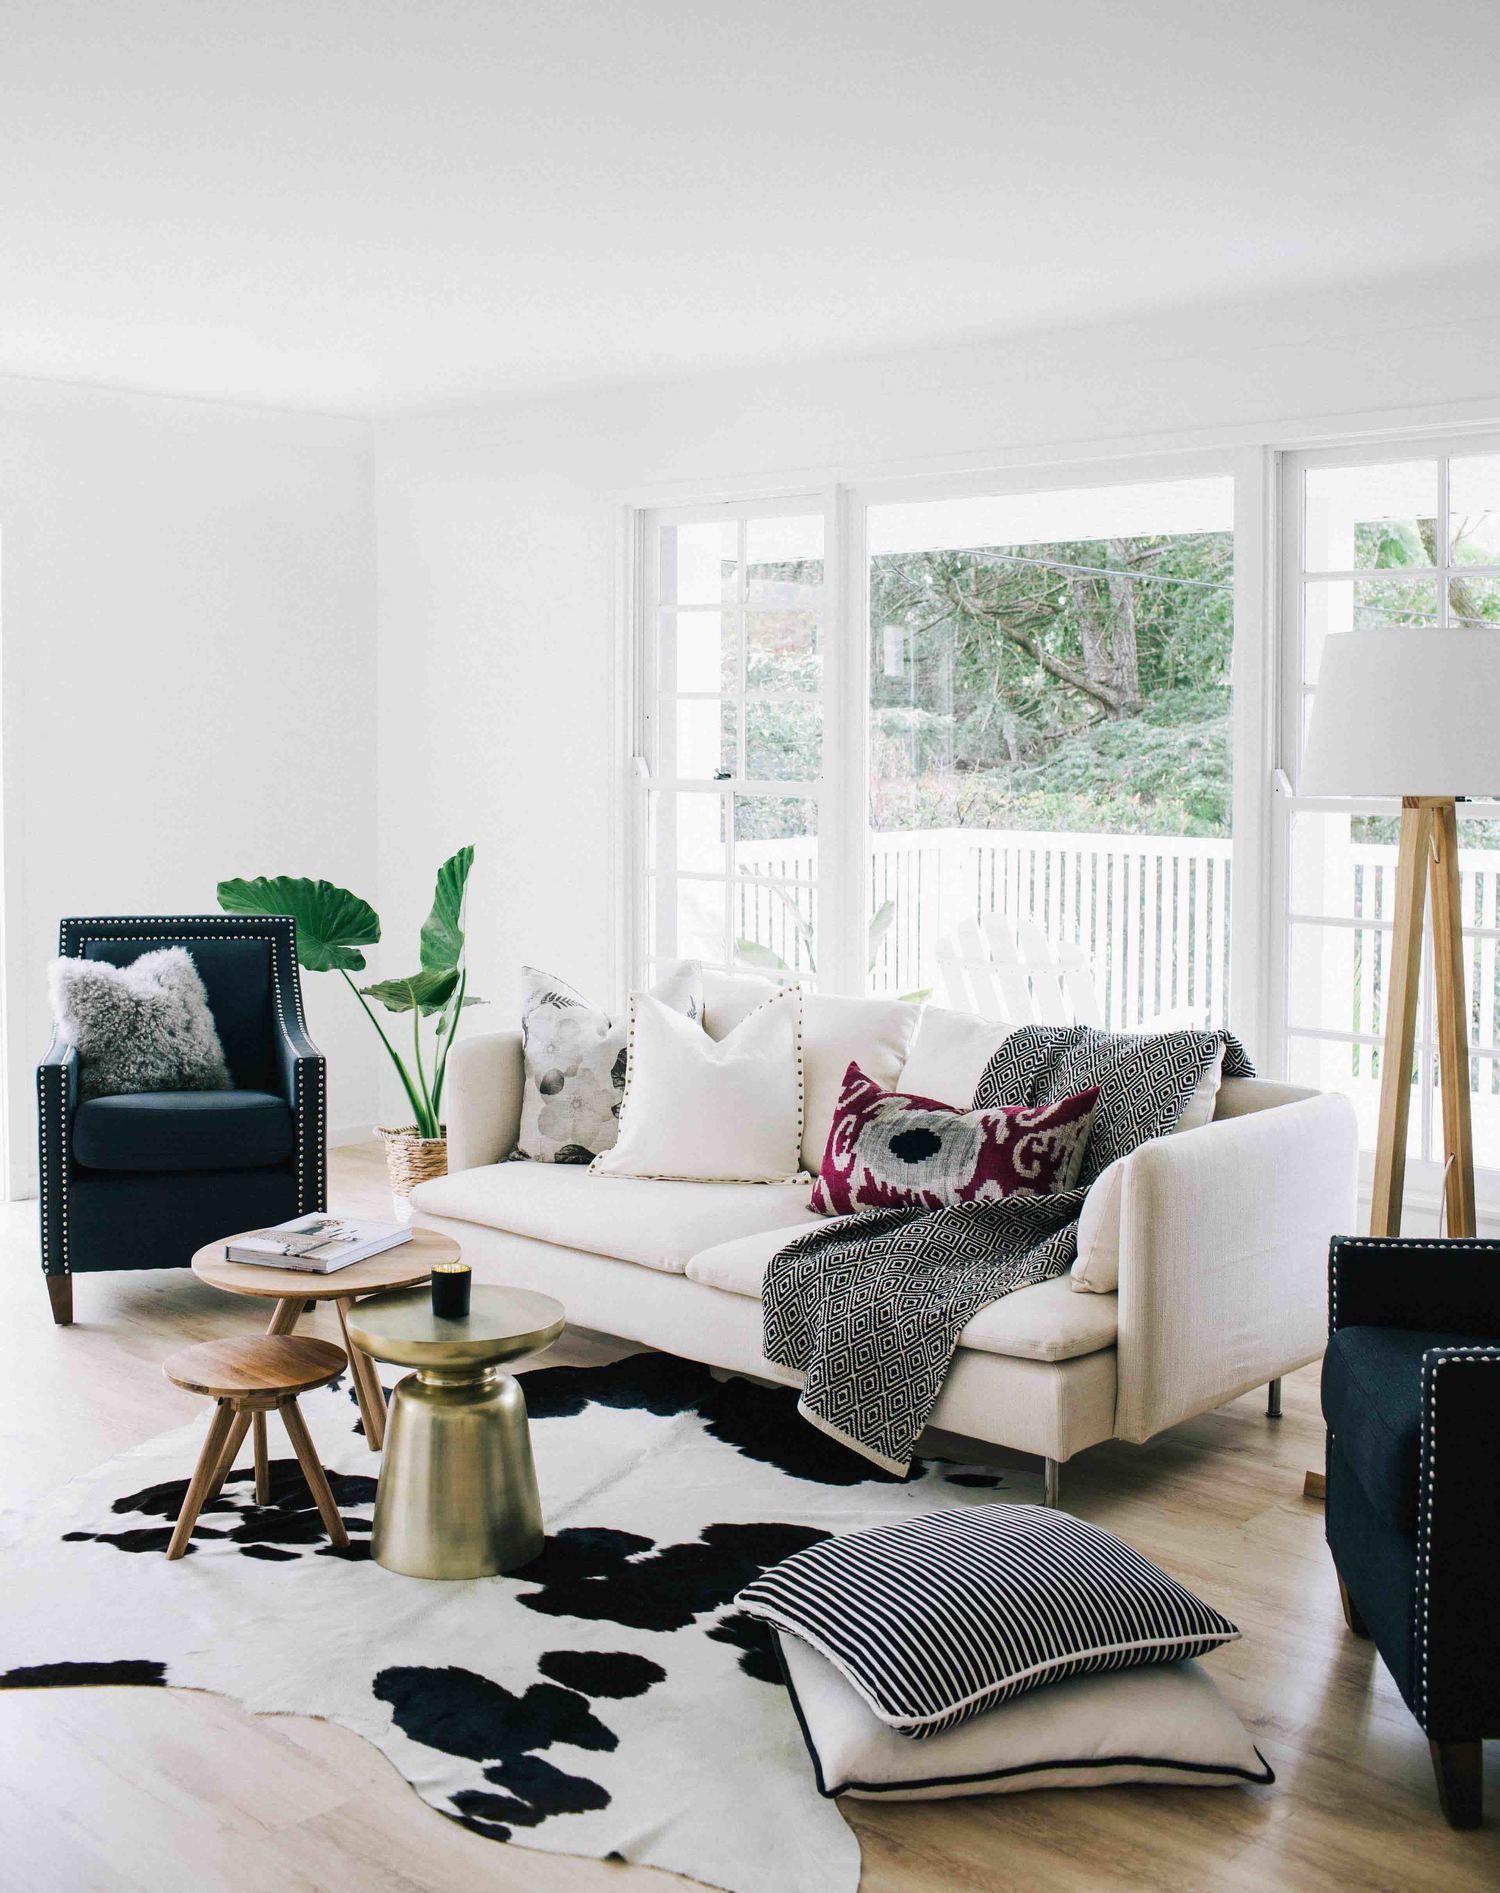 ADORE_CASTLEHILL-1.jpg   Cowhide Rugs   Pinterest   Modern room ...